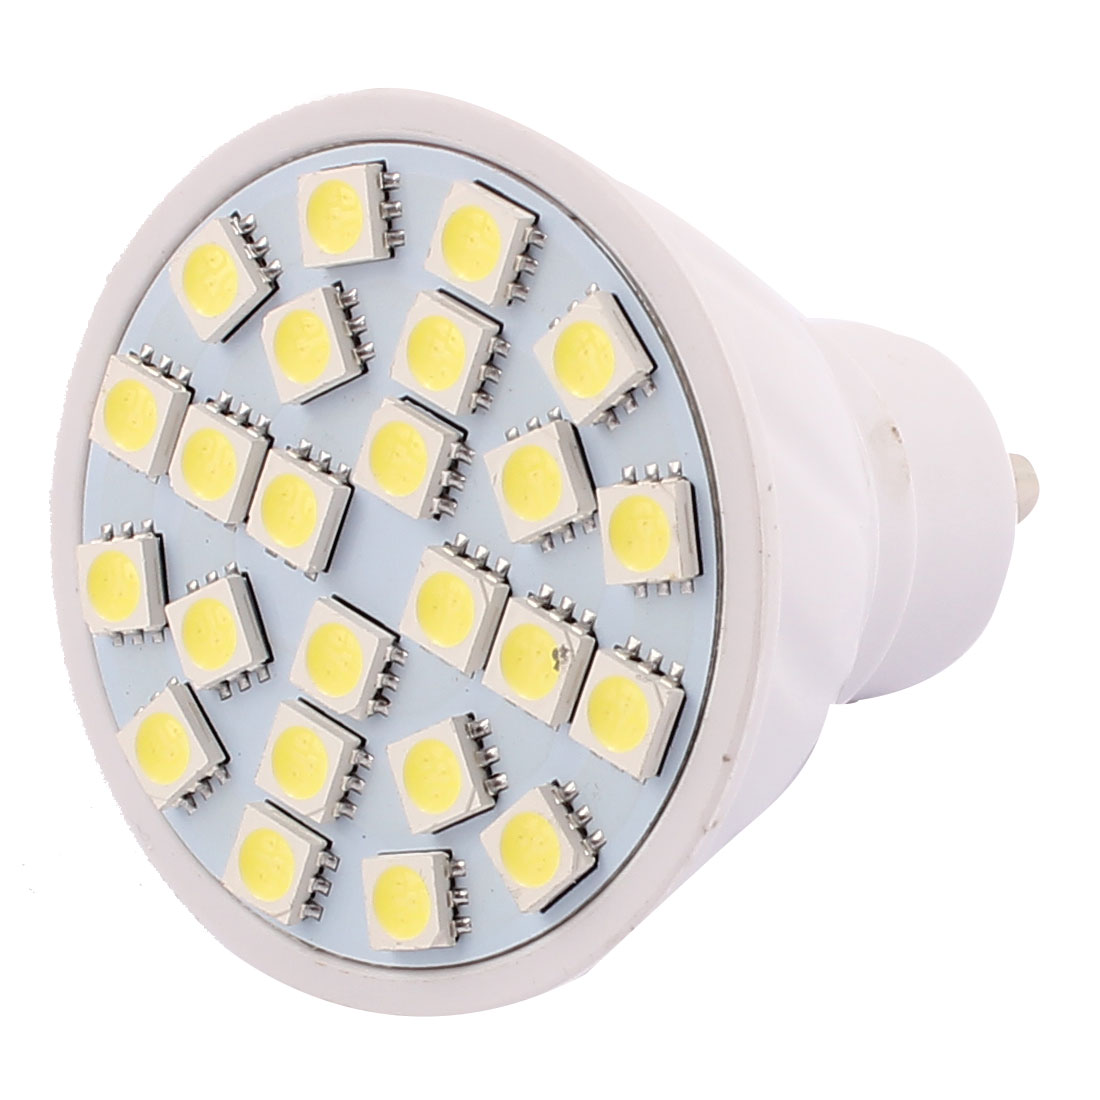 GU10 SMD 5050 24 LEDs Plastic Energy Saving LED Lamp Bulb White AC 110V 3W